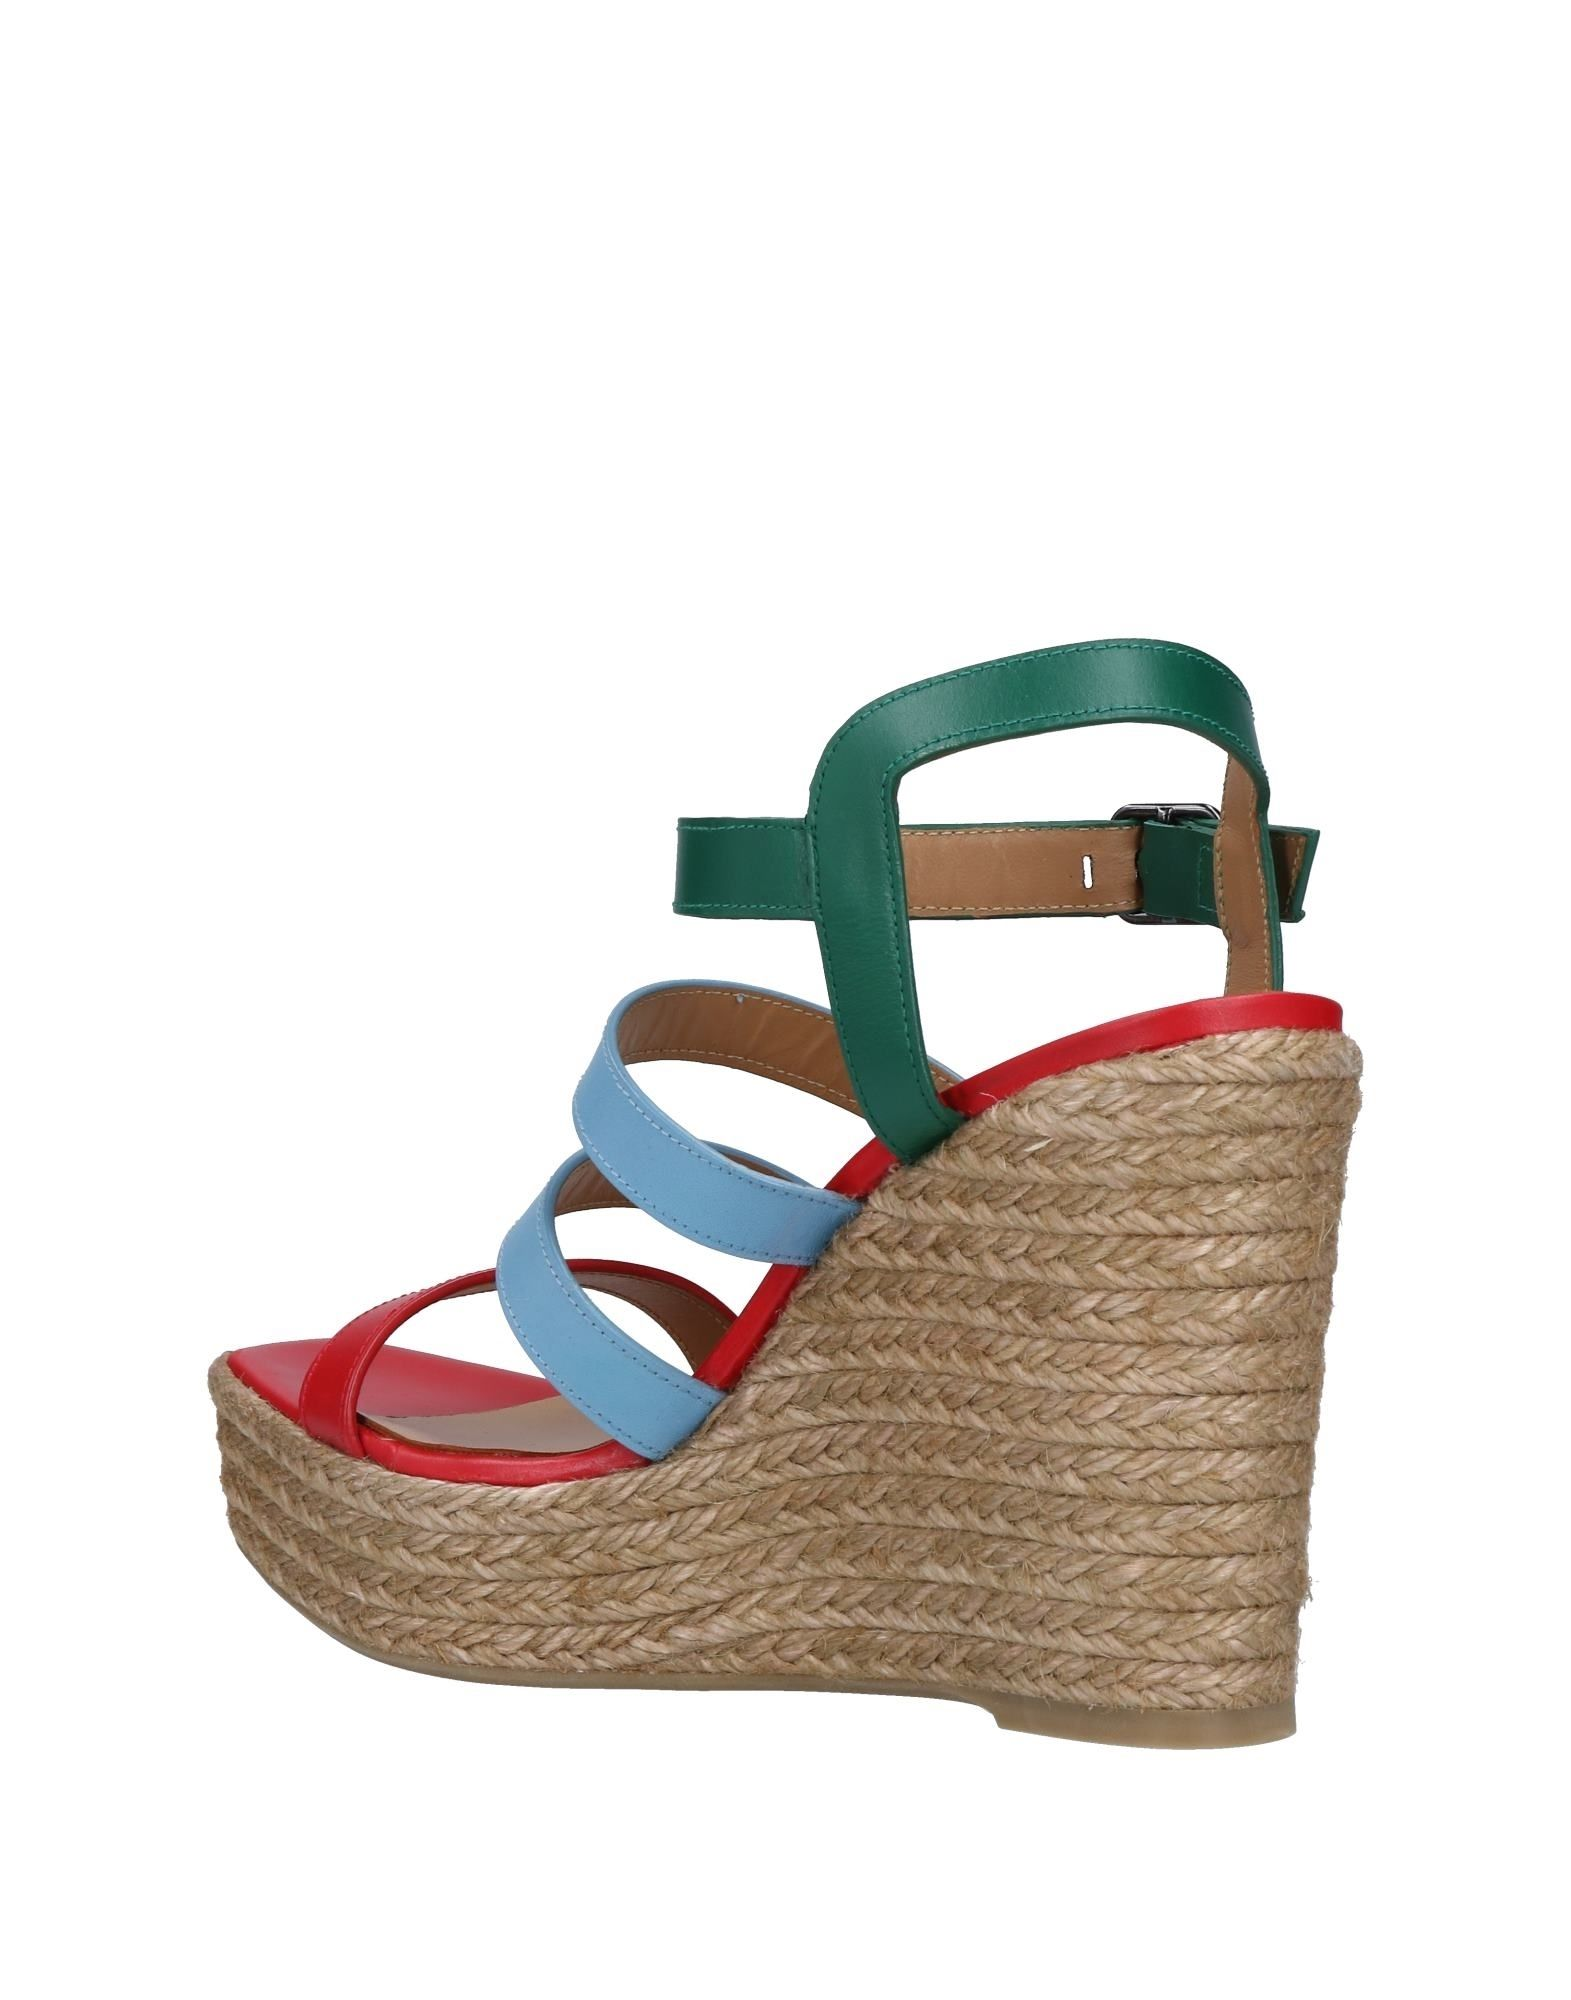 7e15a7a157e ... Castañer Sandals - Women Castañer Sandals online on United United  United Kingdom - 11502187JA ...